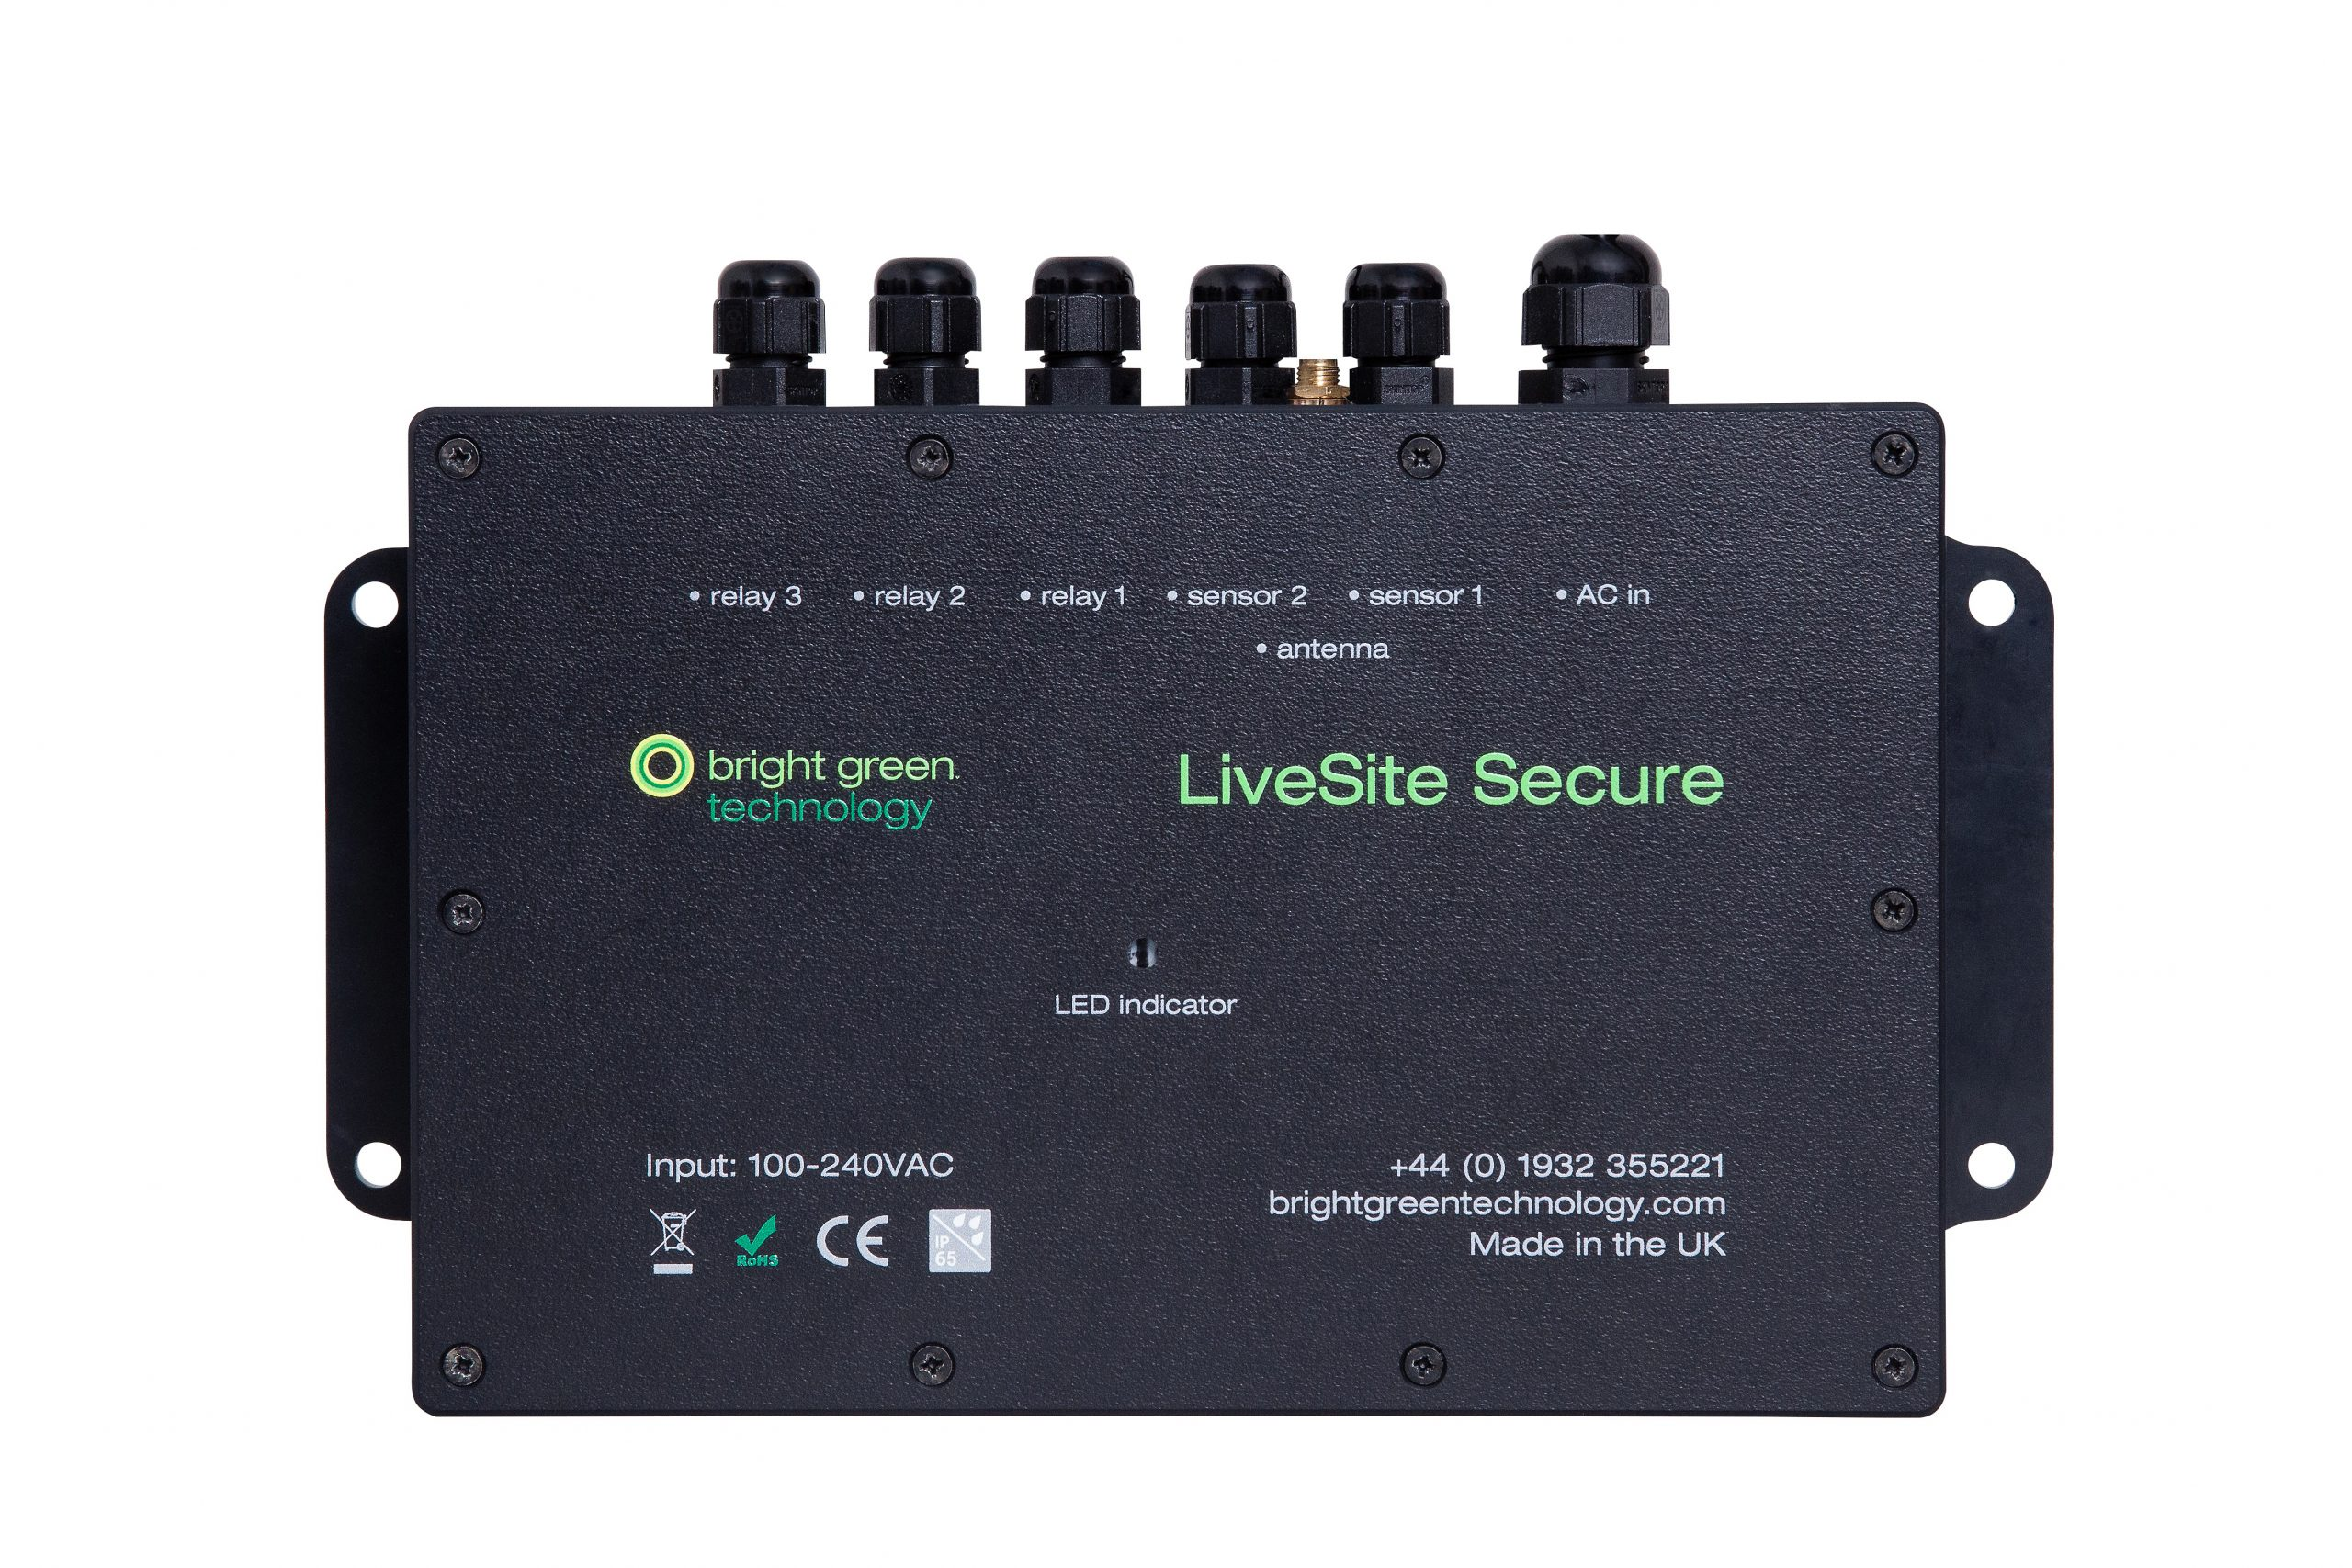 LiveSite Secure product image